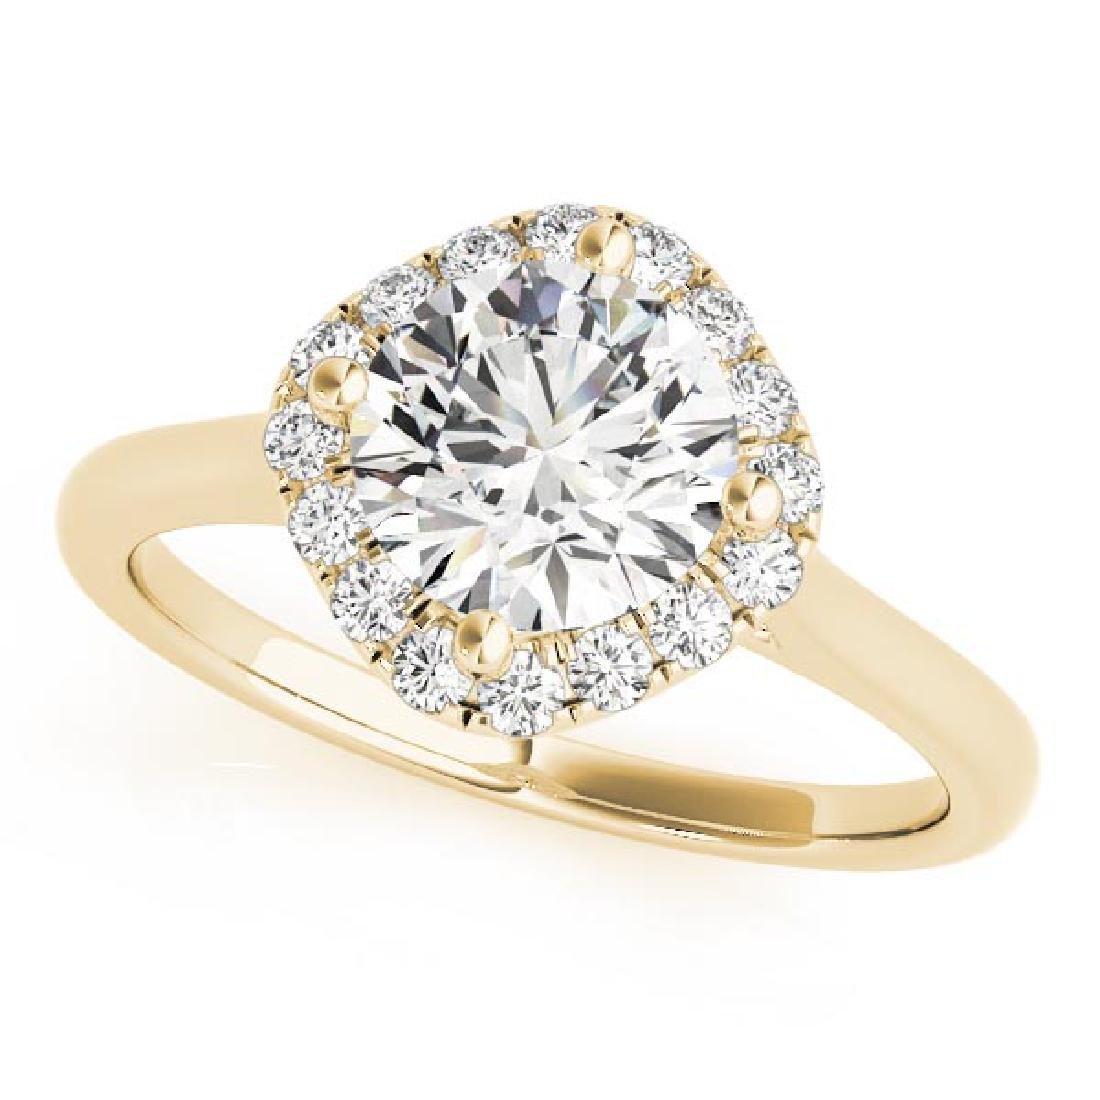 CERTIFIED 18K YELLOW GOLD 1.16 CT G-H/VS-SI1 DIAMOND HA